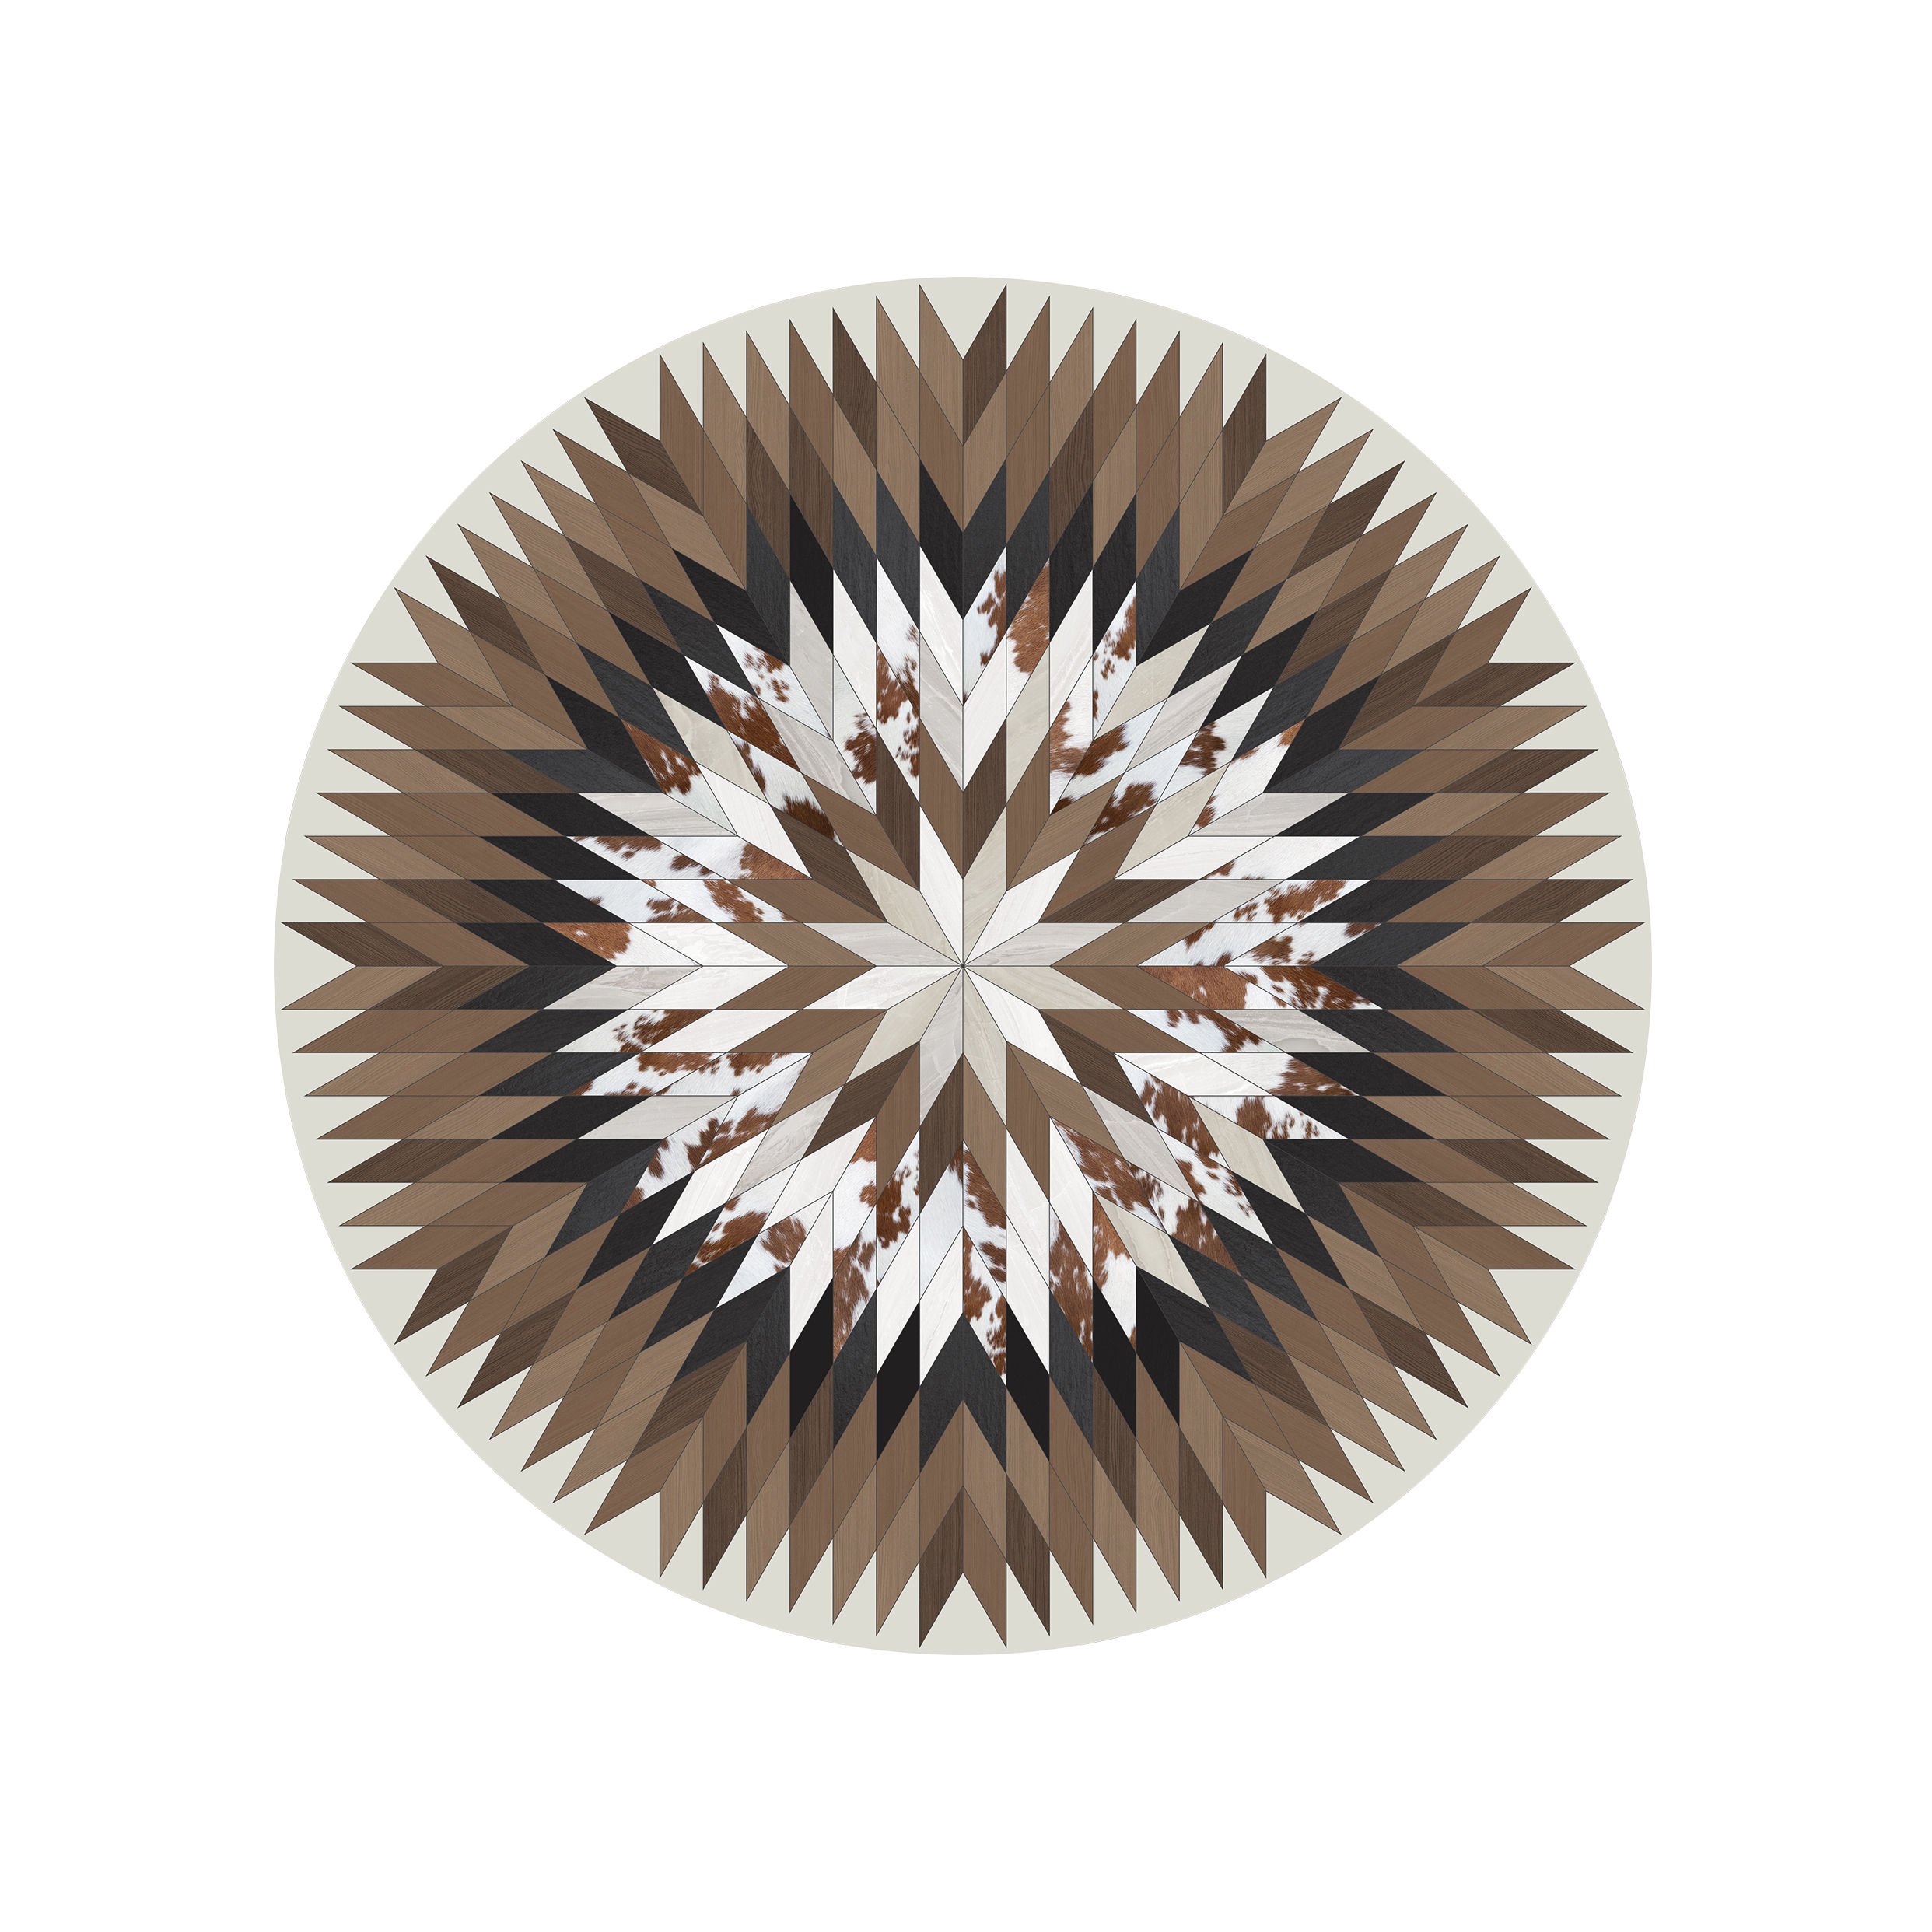 Tapis rodeo star p devache beige marron 99 made - Made in design tapis ...